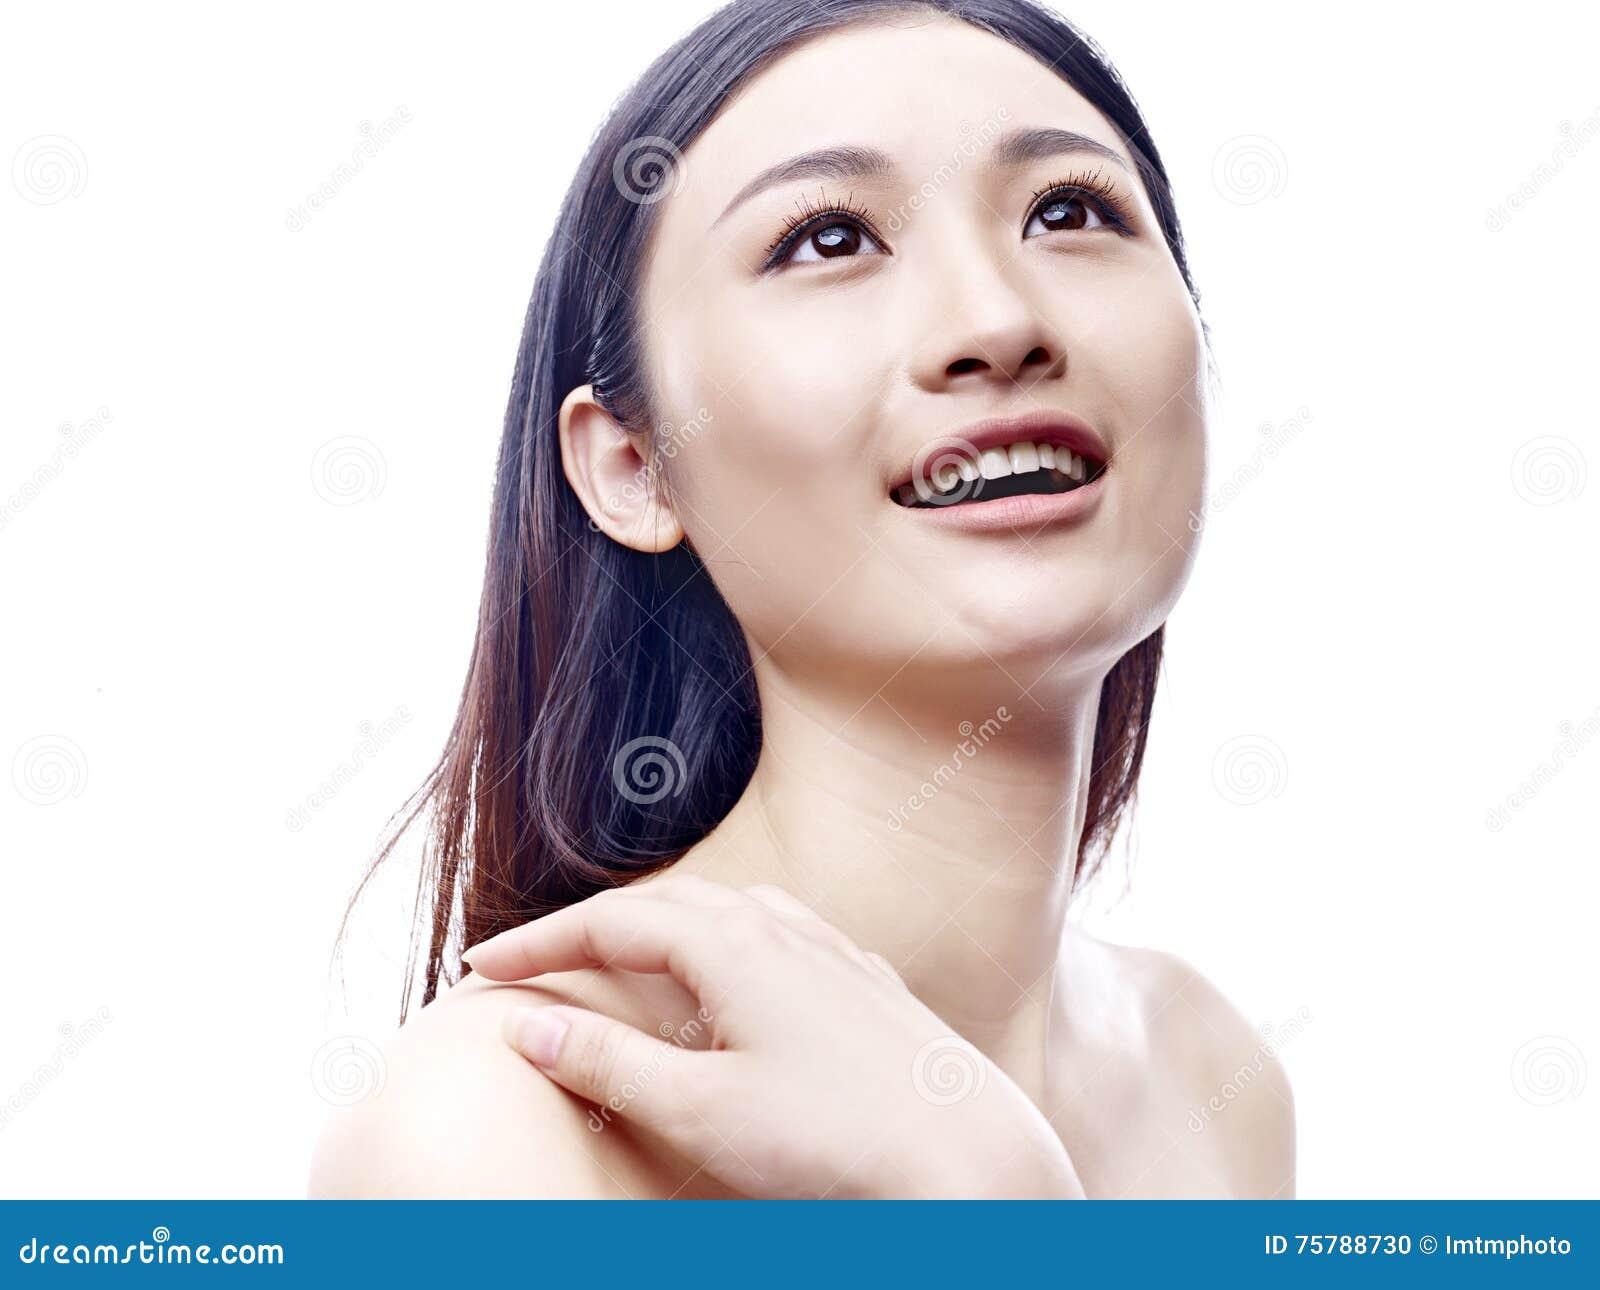 Orgasm with rabbit vibrator